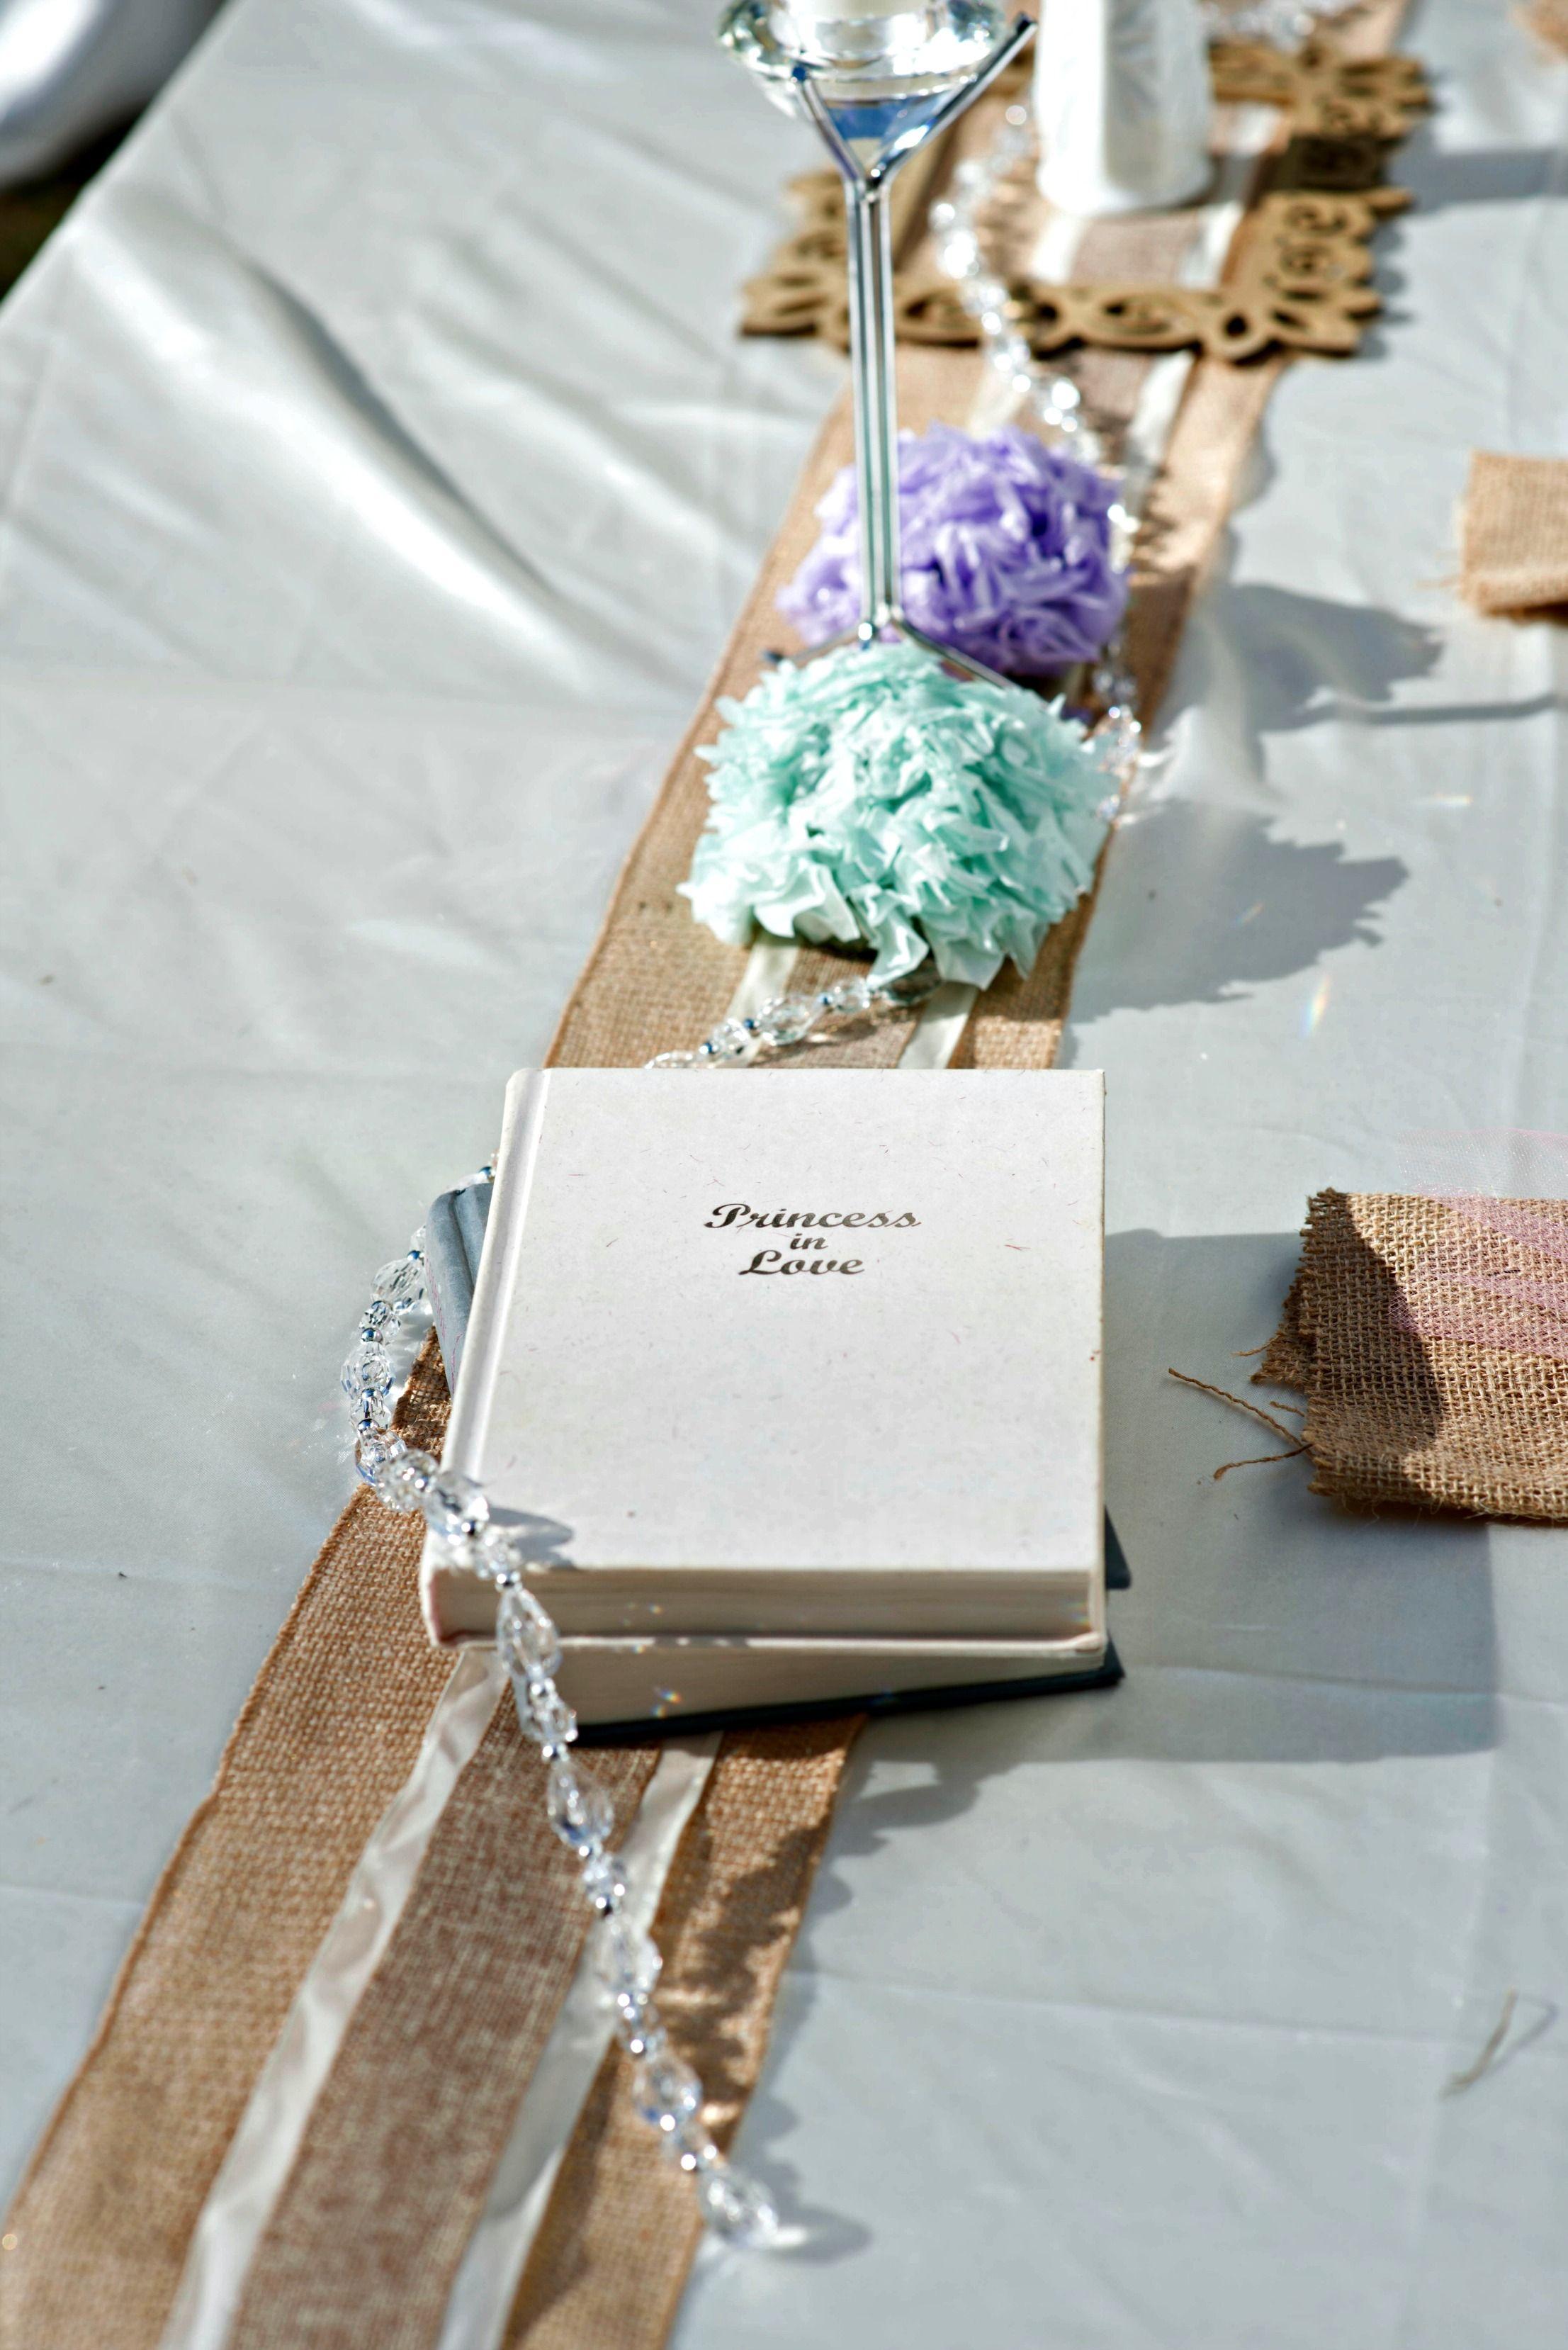 Modern Vintage Favors For Wedding Crest - The Wedding Ideas ...